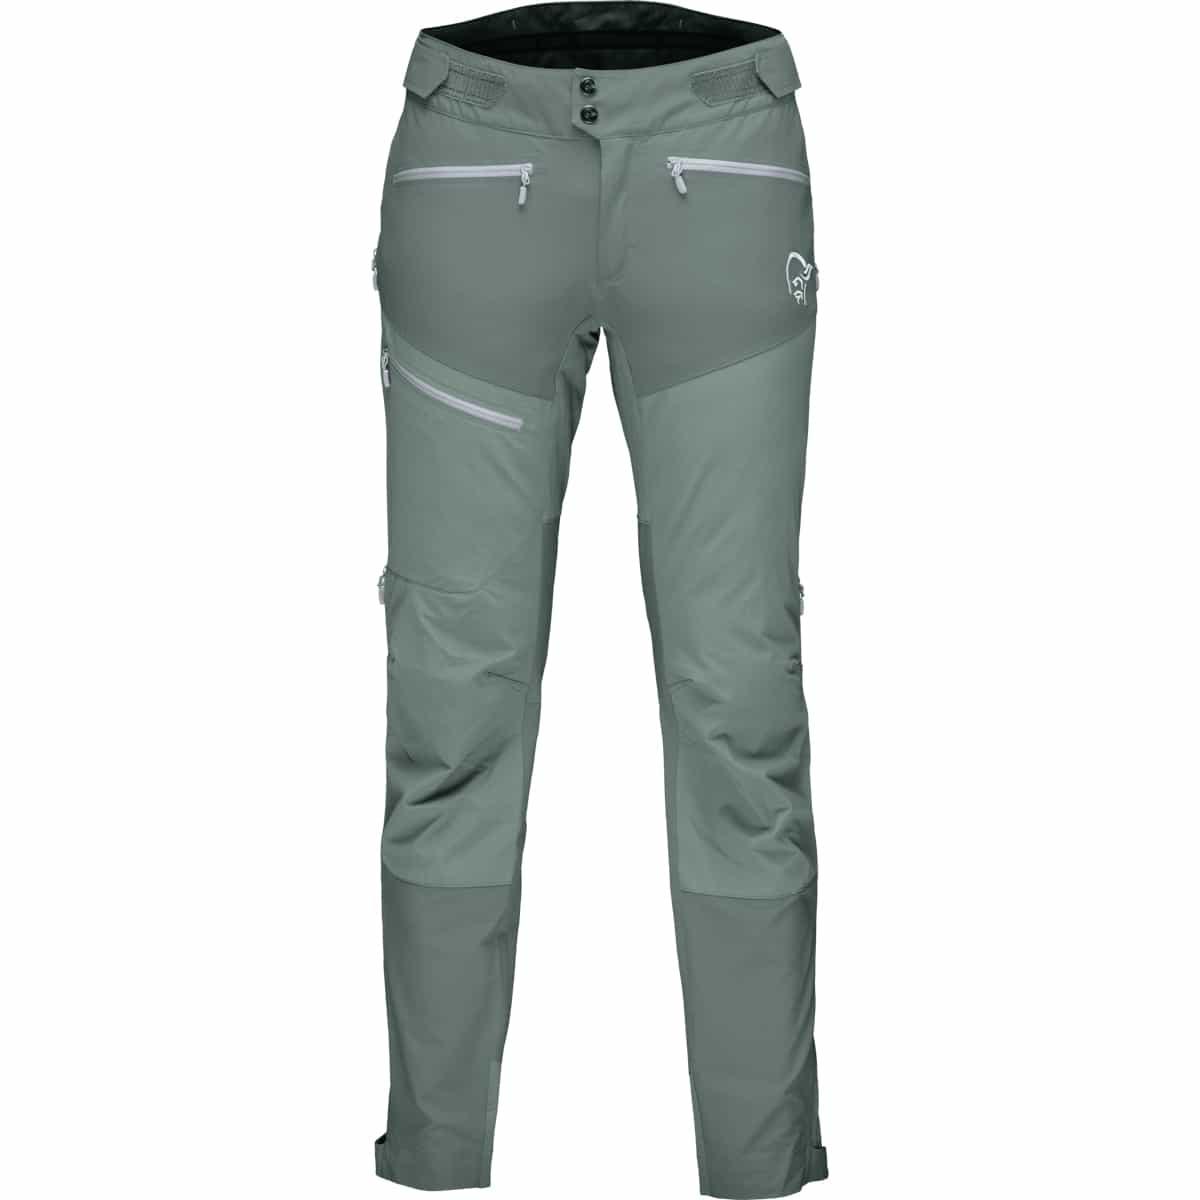 Norrøna Fjørå Flex1 Pants (M) Castor GreyCaviar | Fjellsport.no